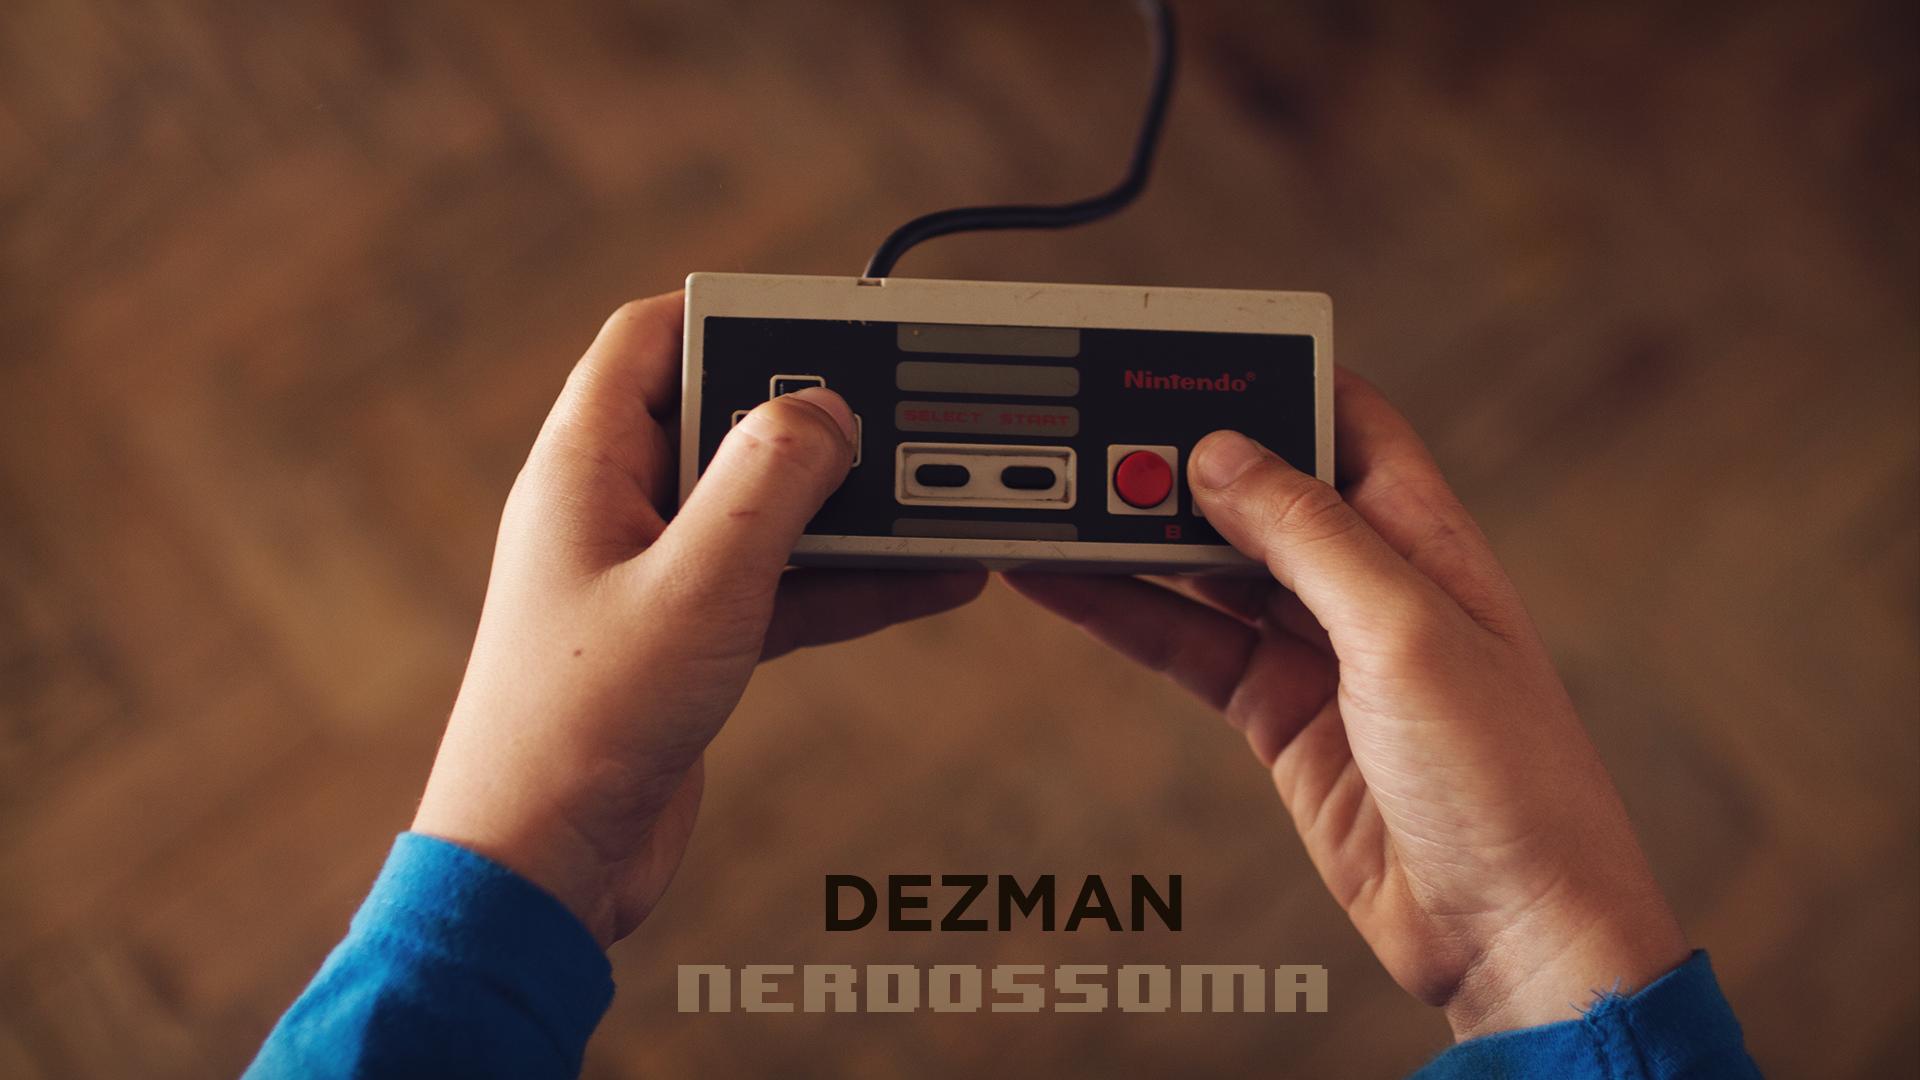 Dezman - Nerdossoma (EP)